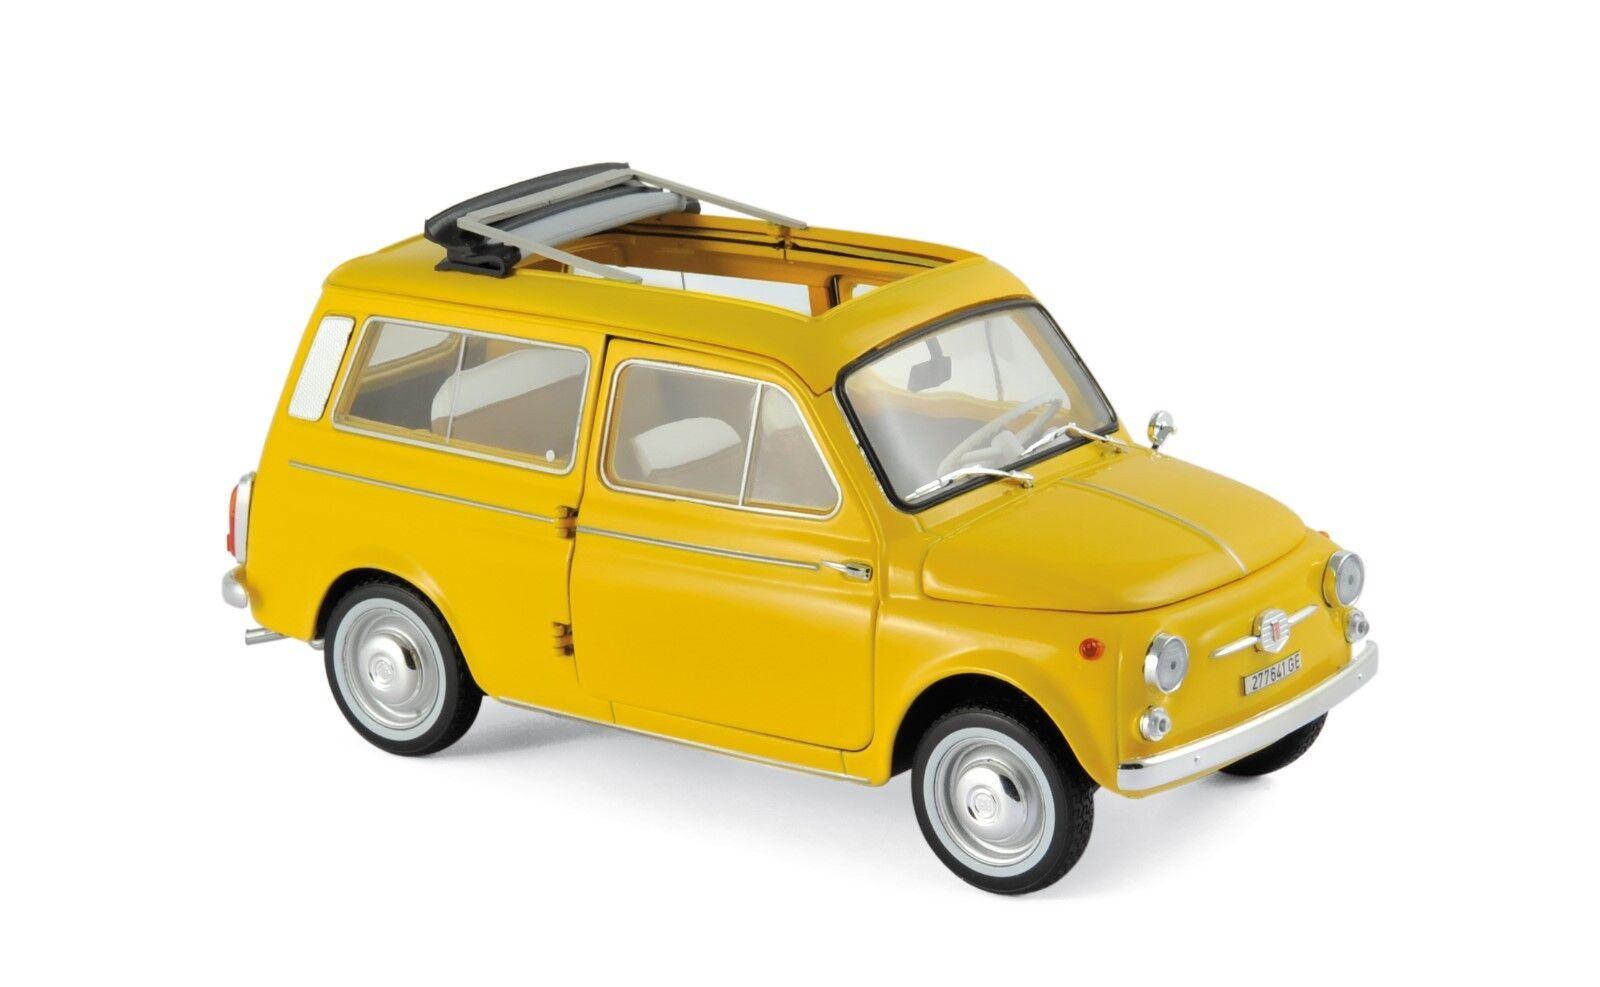 Fiat 500 Giardiniera 1968 jaune 1 18 Norev 187724 NOUVEAU & NEUF dans sa boîte